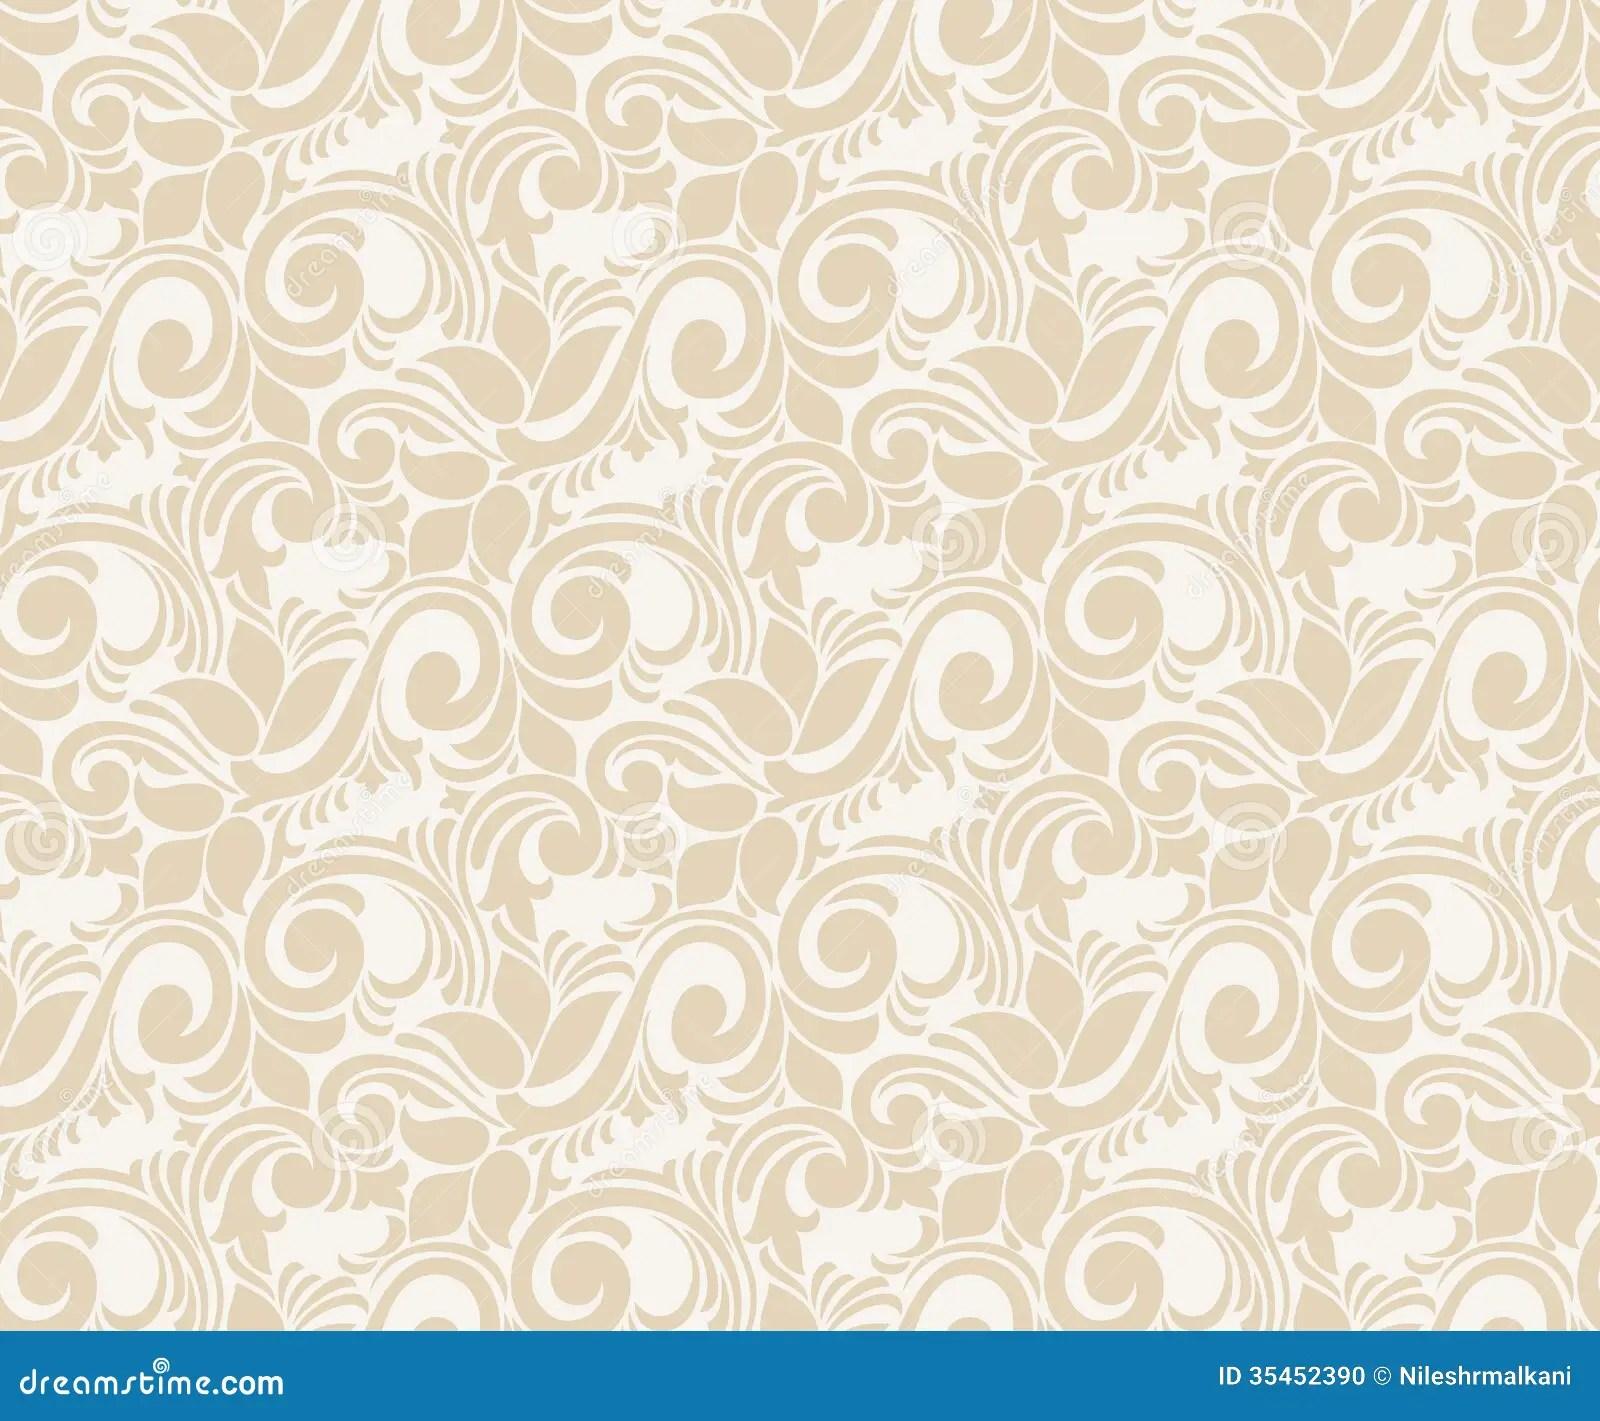 Seamless Vector Wallpaper Stock Vector Illustration Of Card 35452390